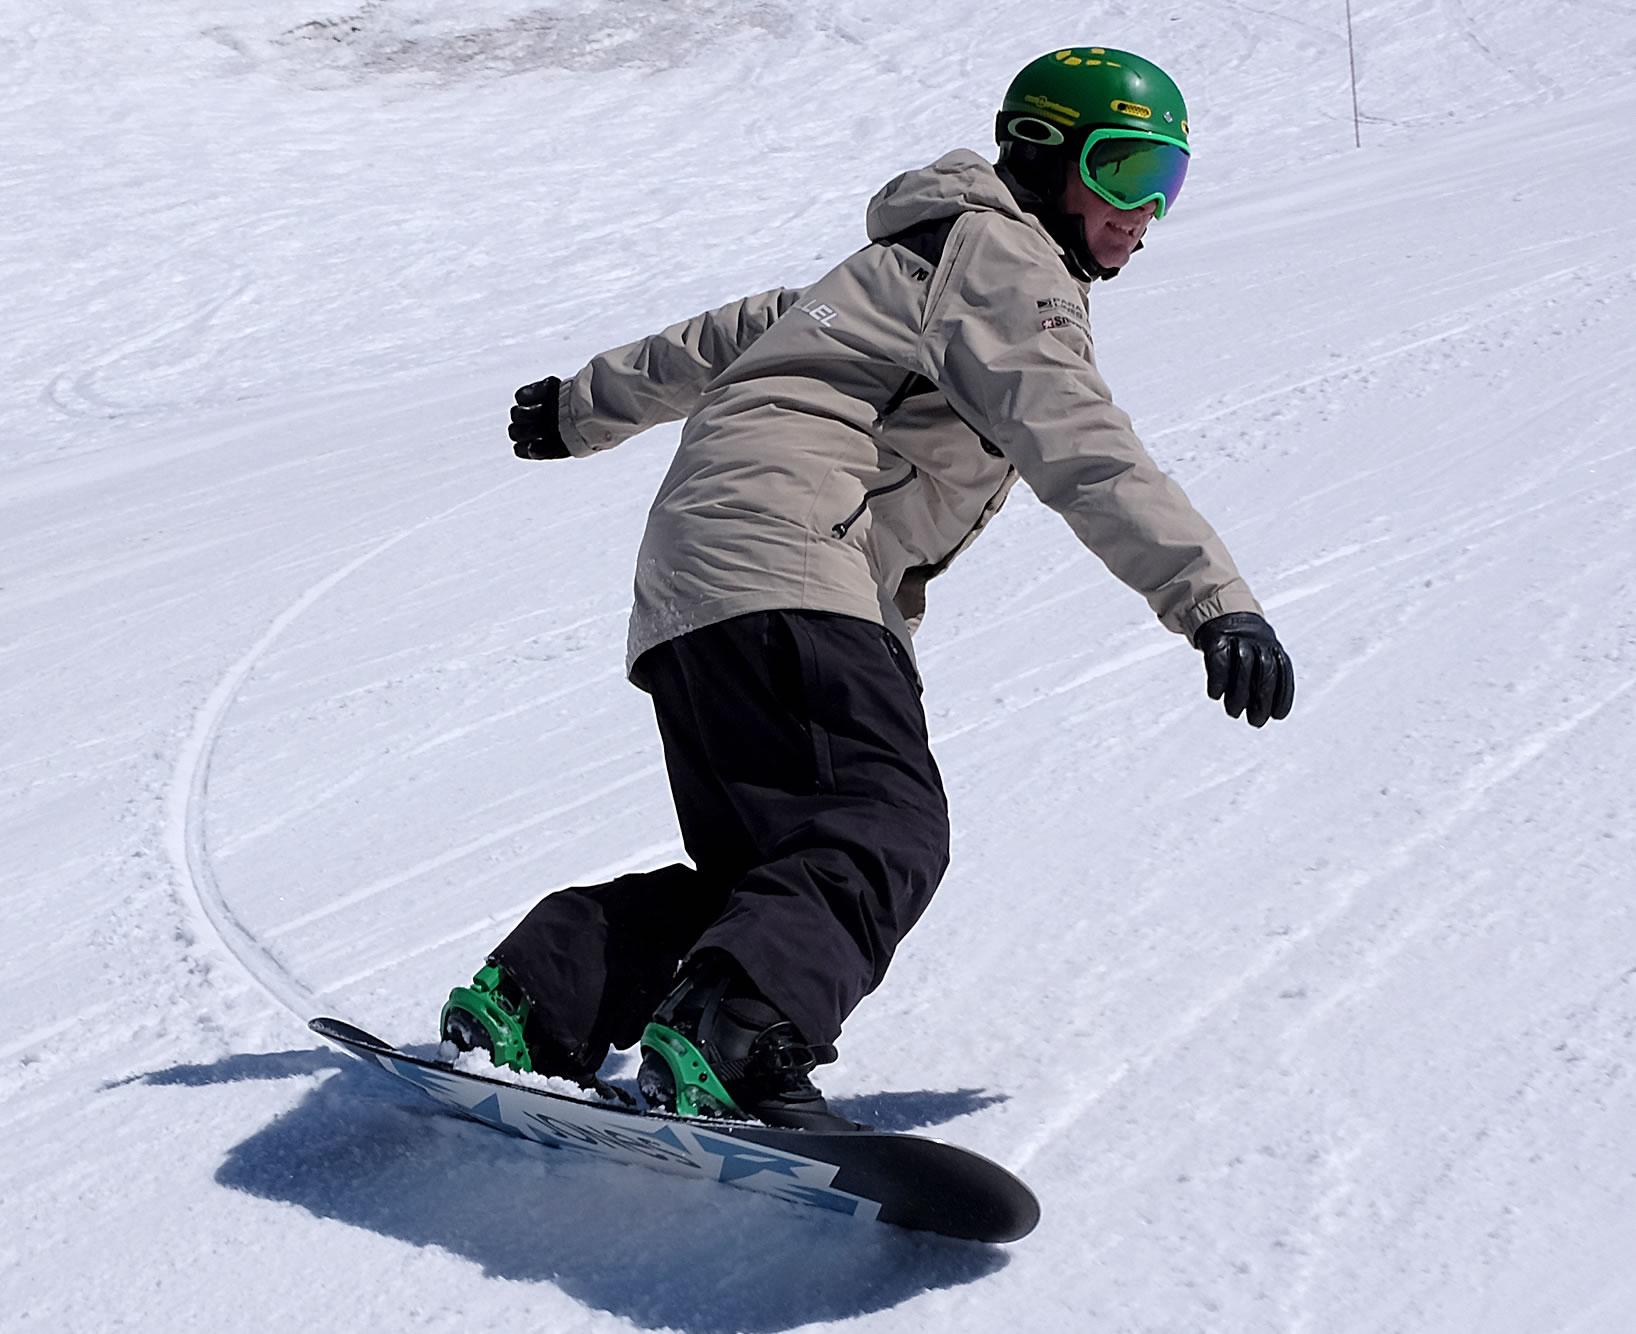 Meribel Ski & Snowboard School | Group Snowboarding Lessons